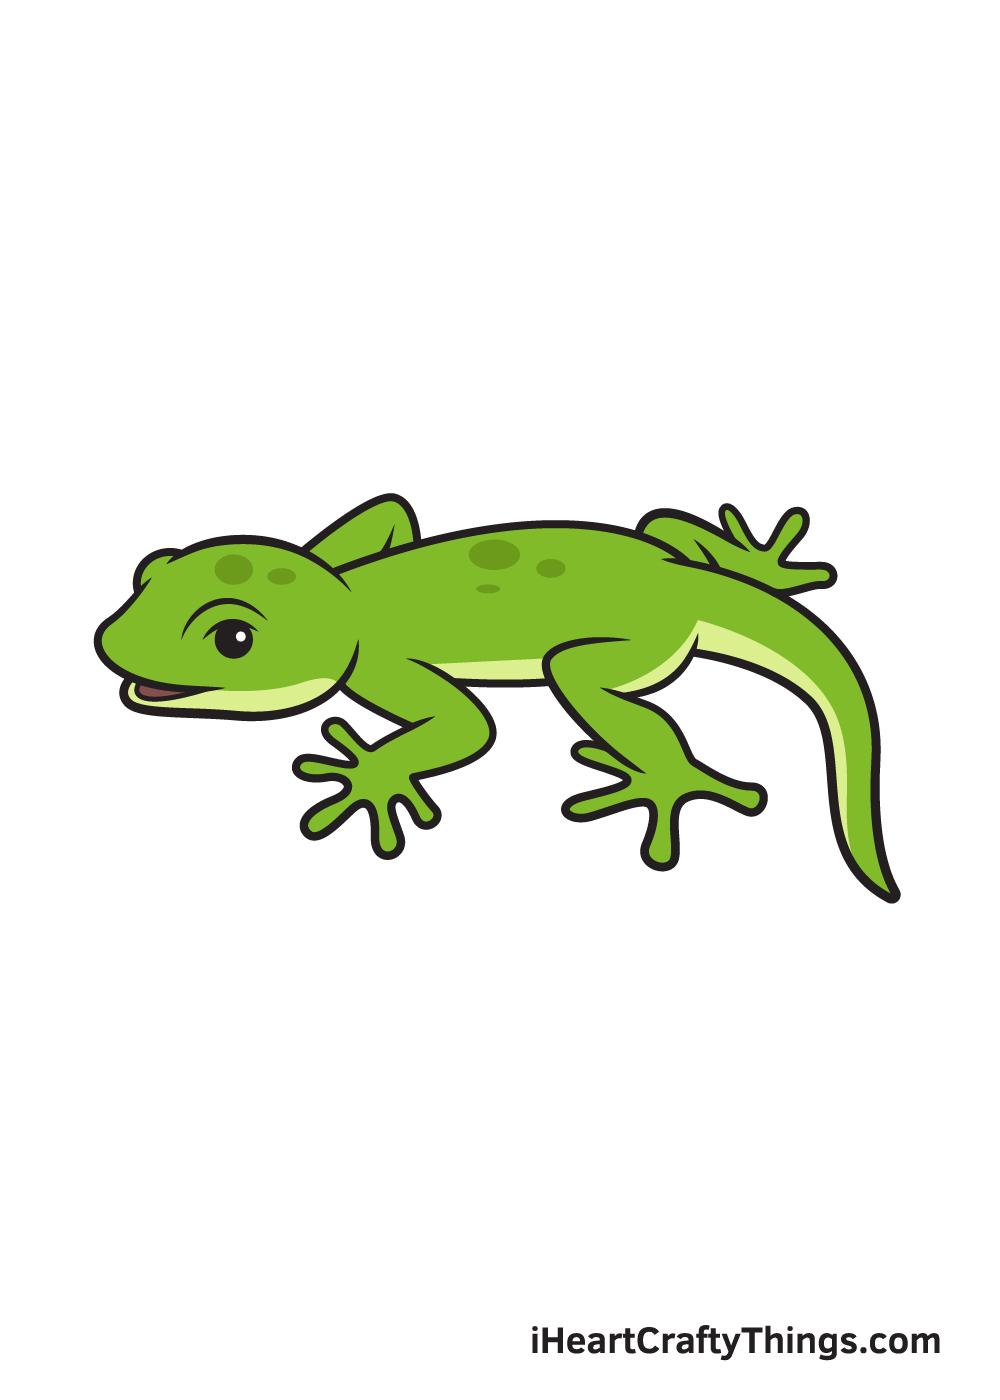 lizard drawing 9 steps